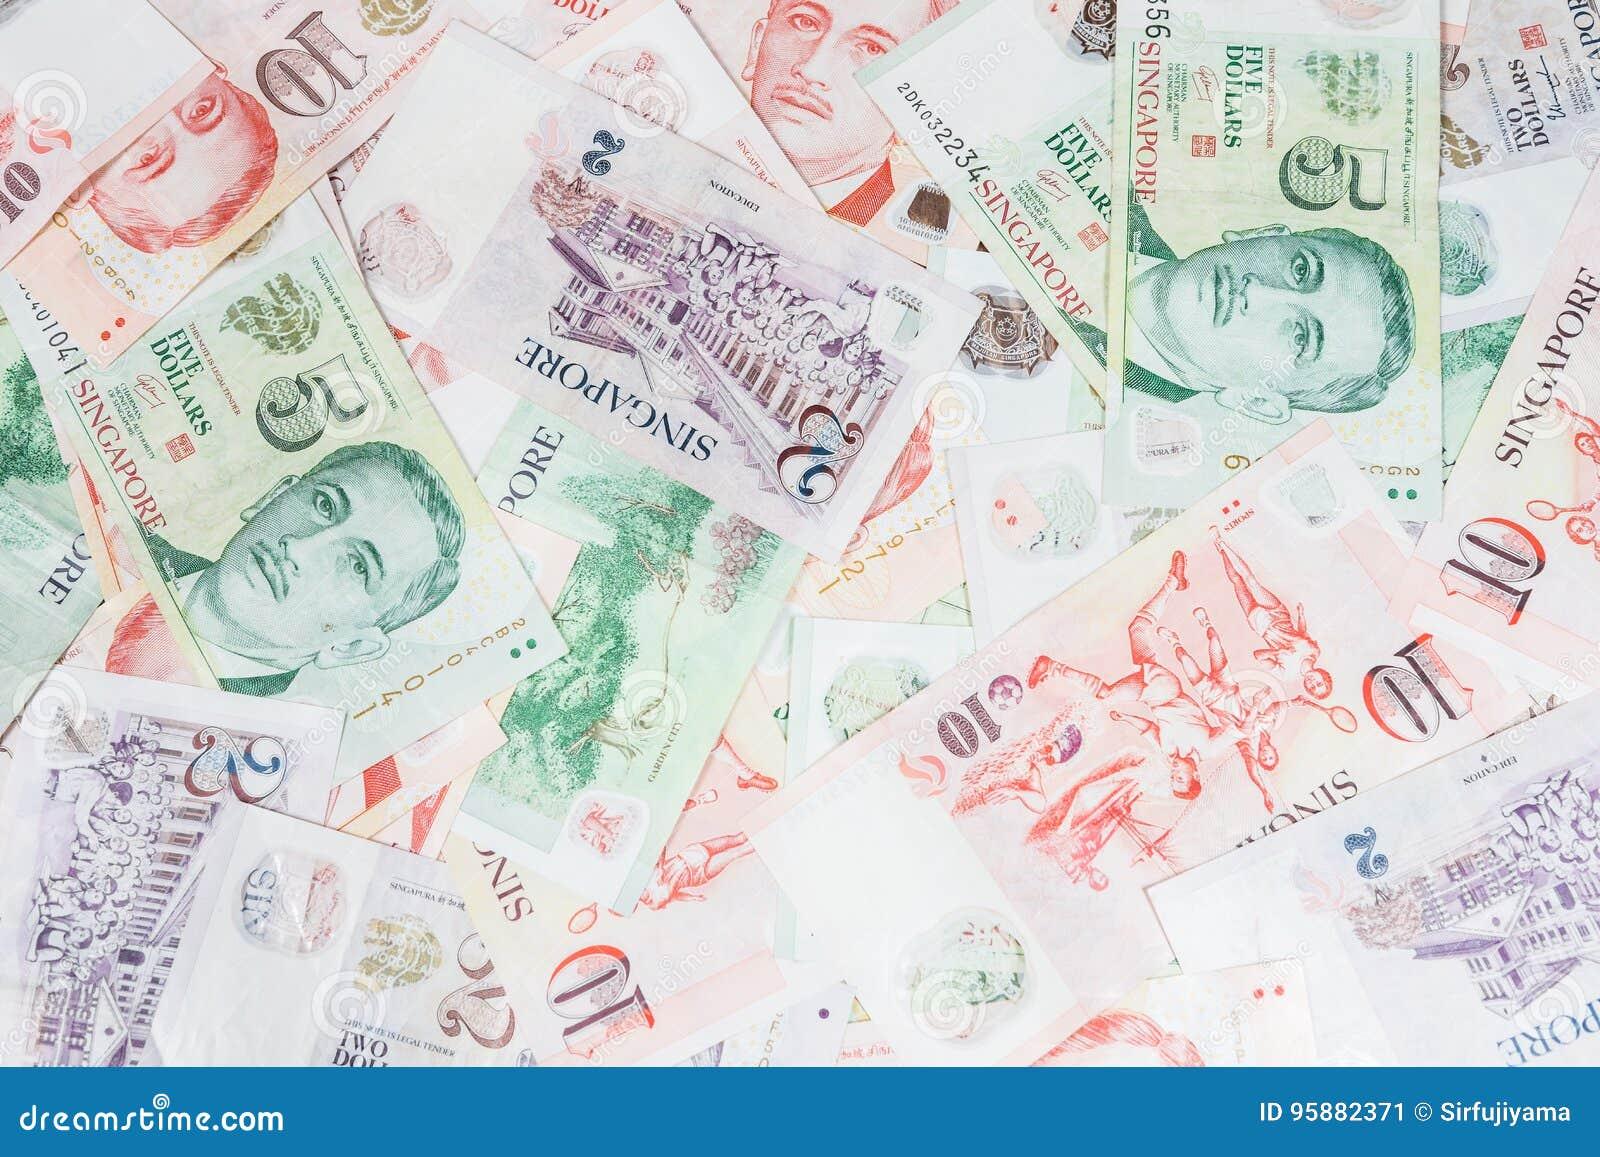 Singapore money stock image  Image of dollar, rich, exchange